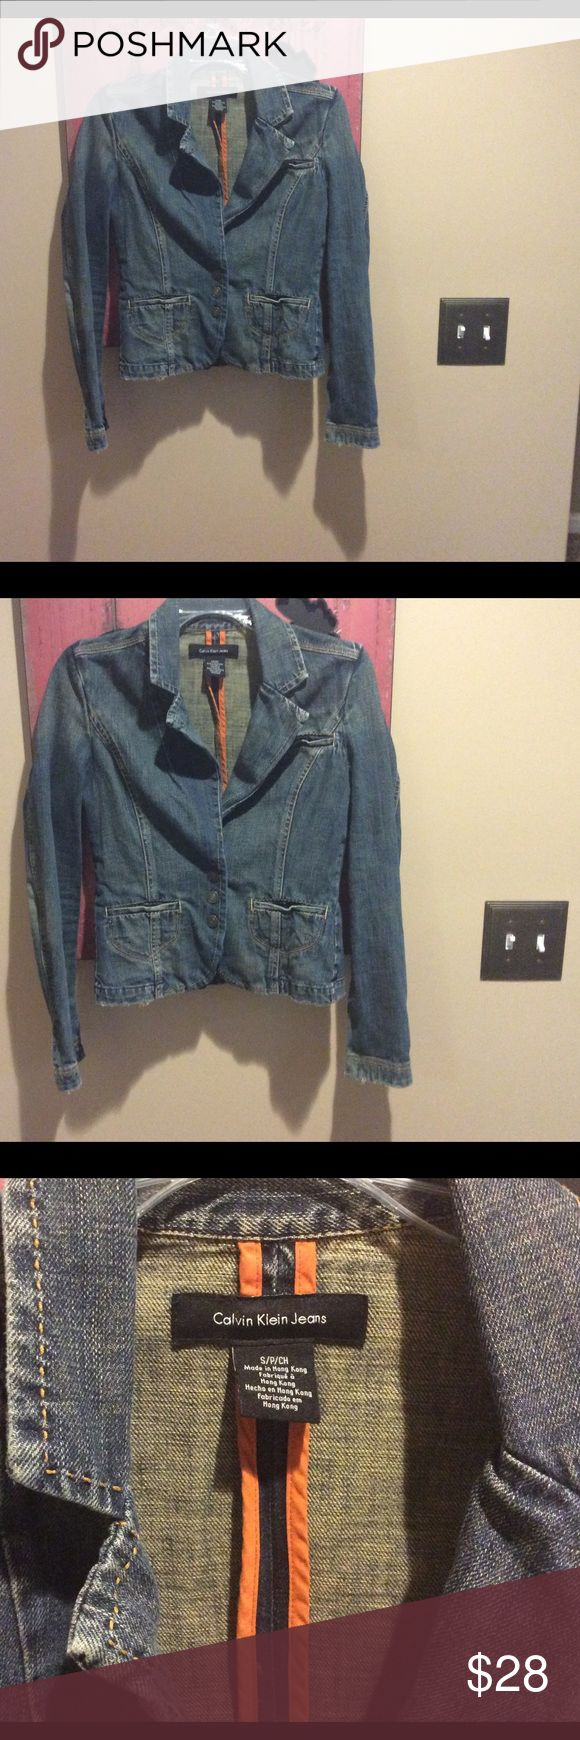 Calvin Klein jean jacket Adorable, distressed Calvin Klein jean jacket! So cute!!  Size small.  💕😊 Calvin Klein Jackets & Coats Jean Jackets